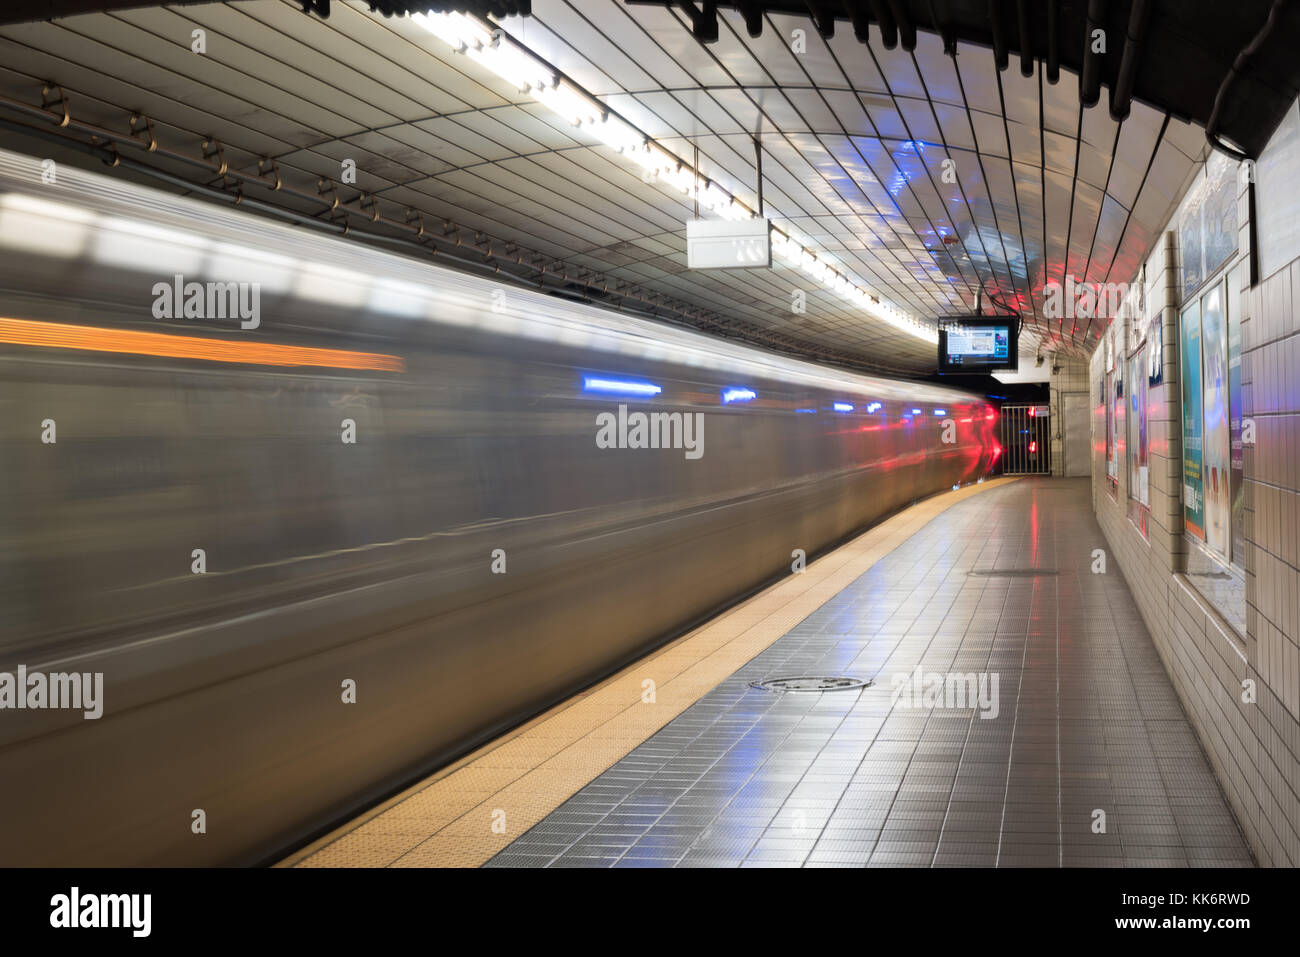 Jersey City, NJ - November 13, 2016: Train passing through